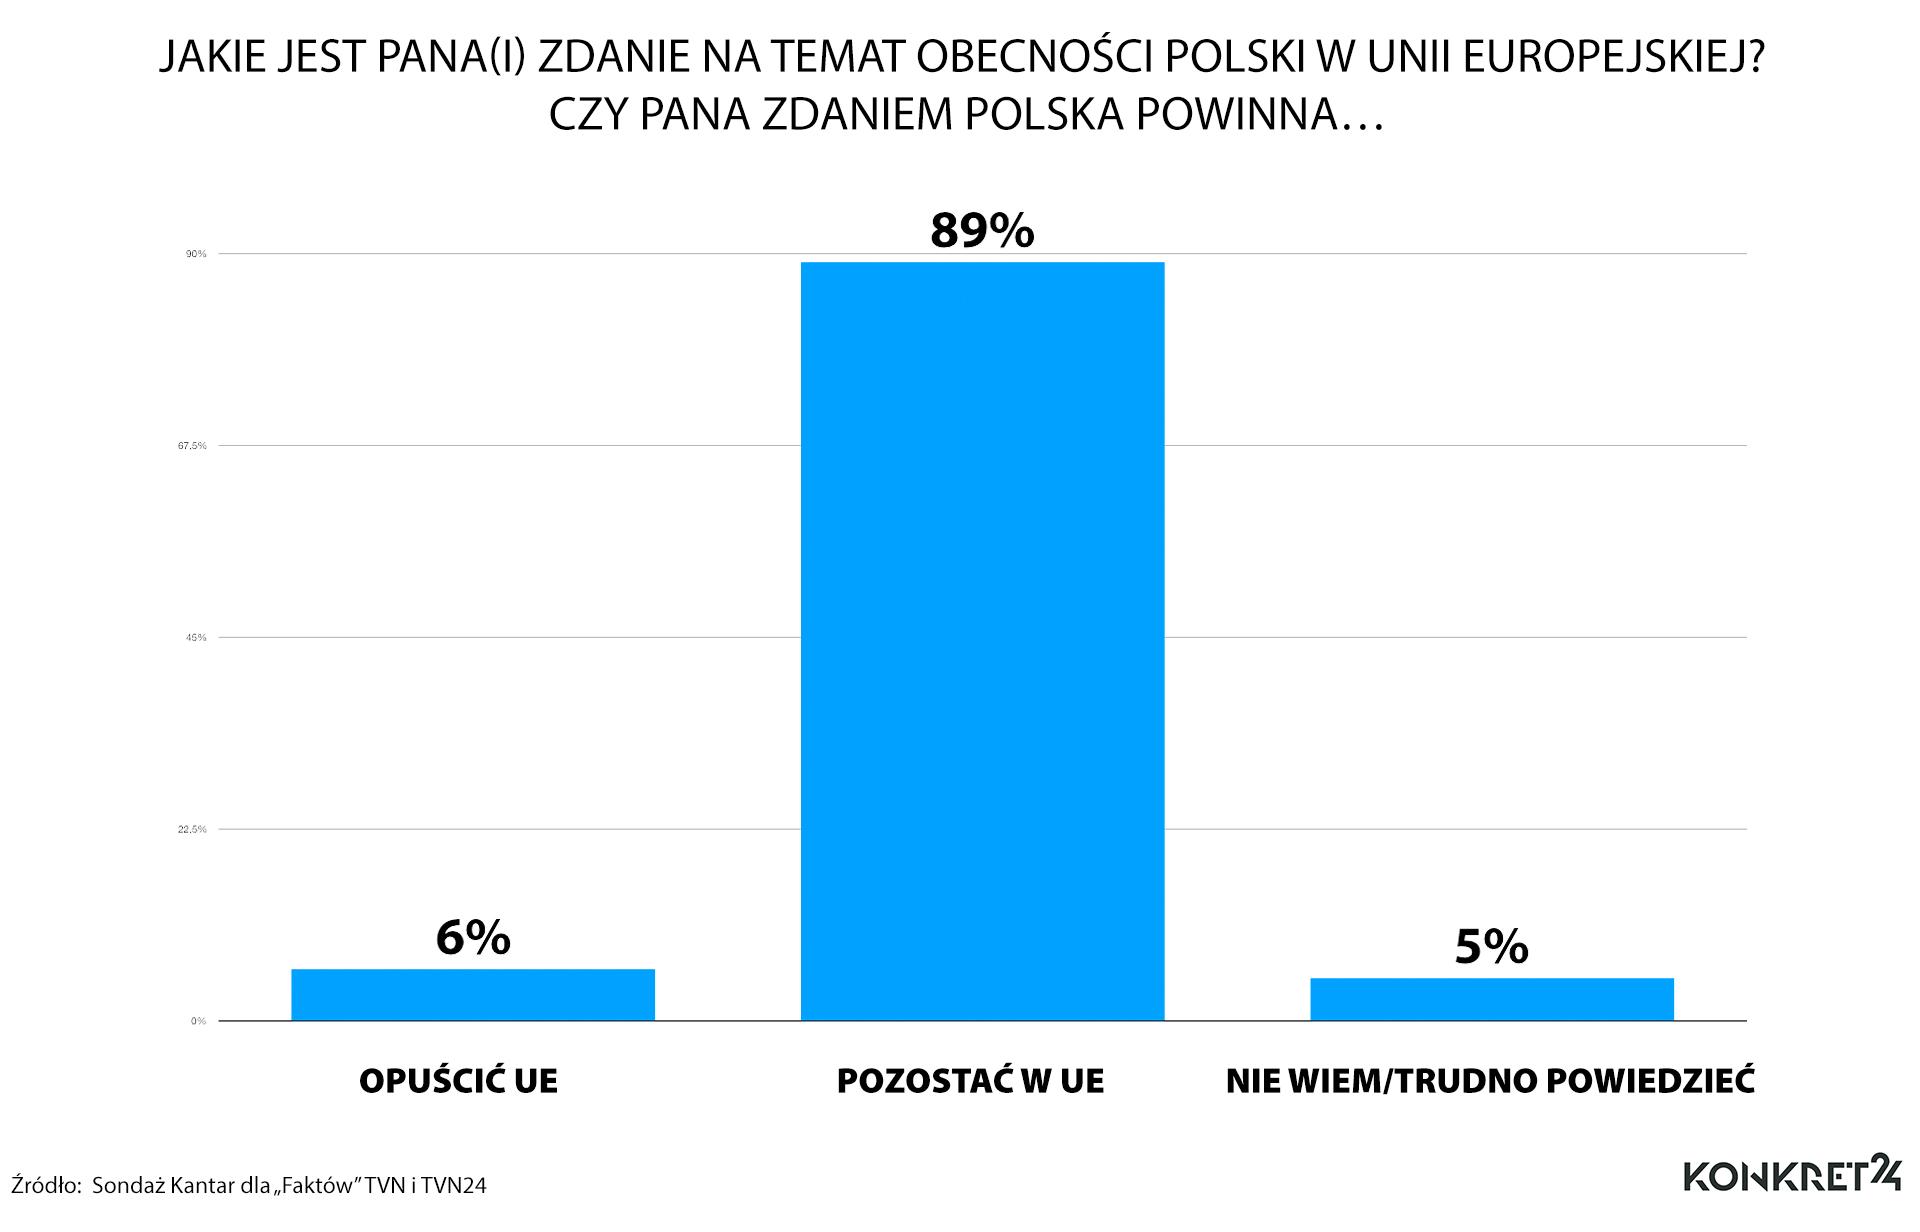 Czy Polska powinna opuścić Unię Europejską?